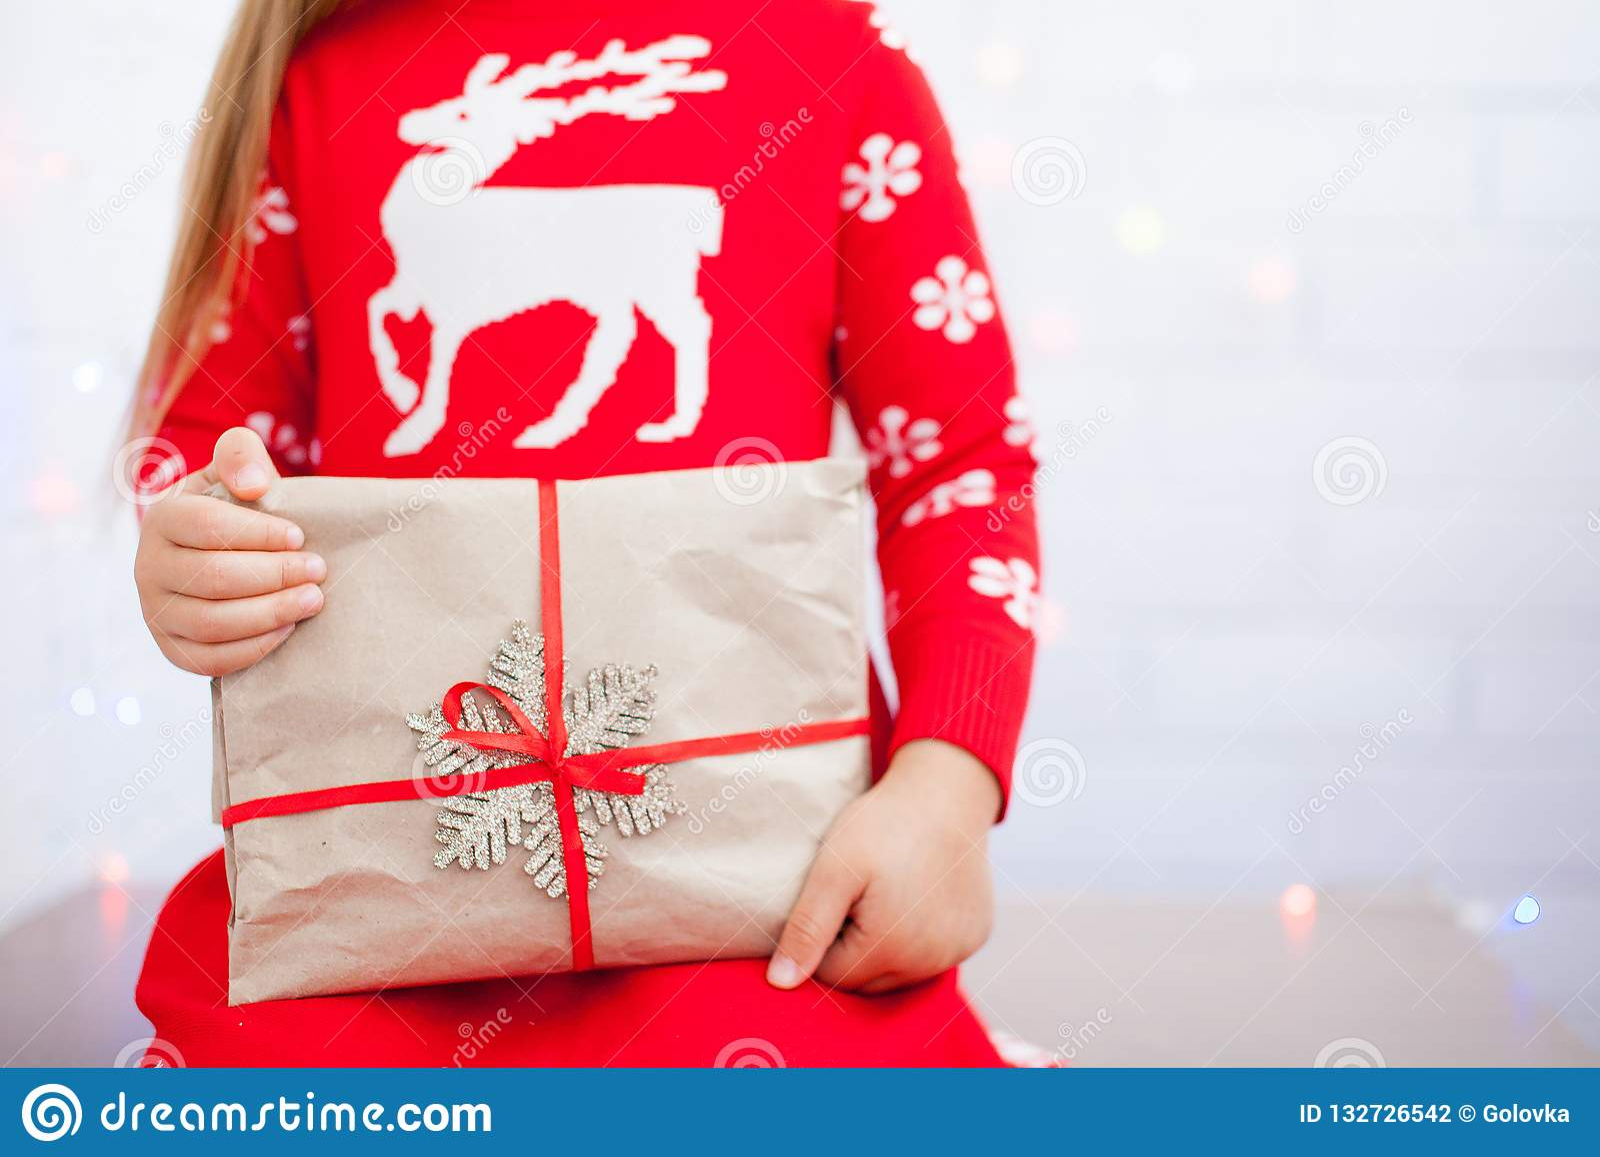 Hands of little girl is holding Christmas gift